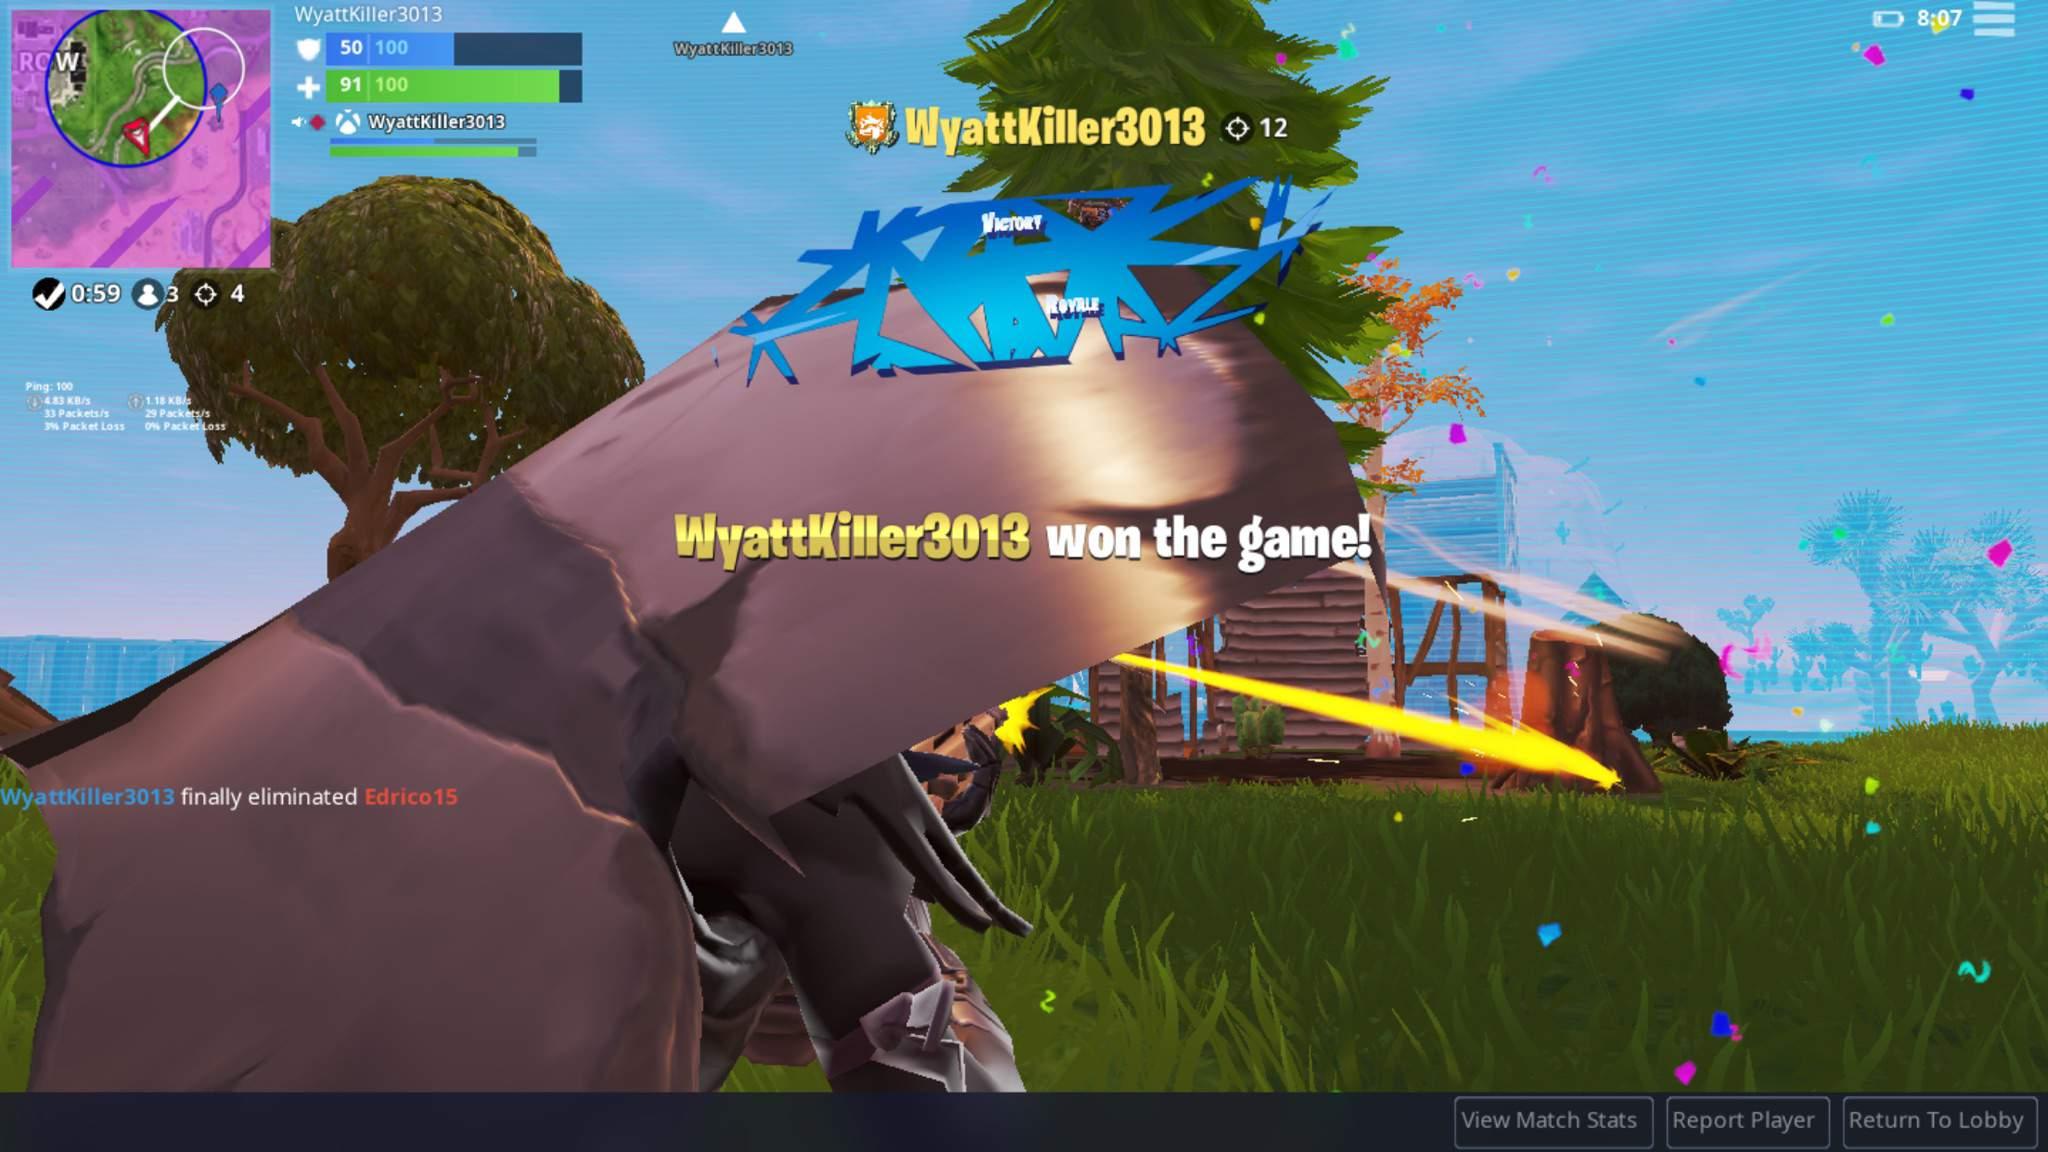 Welp i had a bad fortnite day but got my 248th Win + the new skin